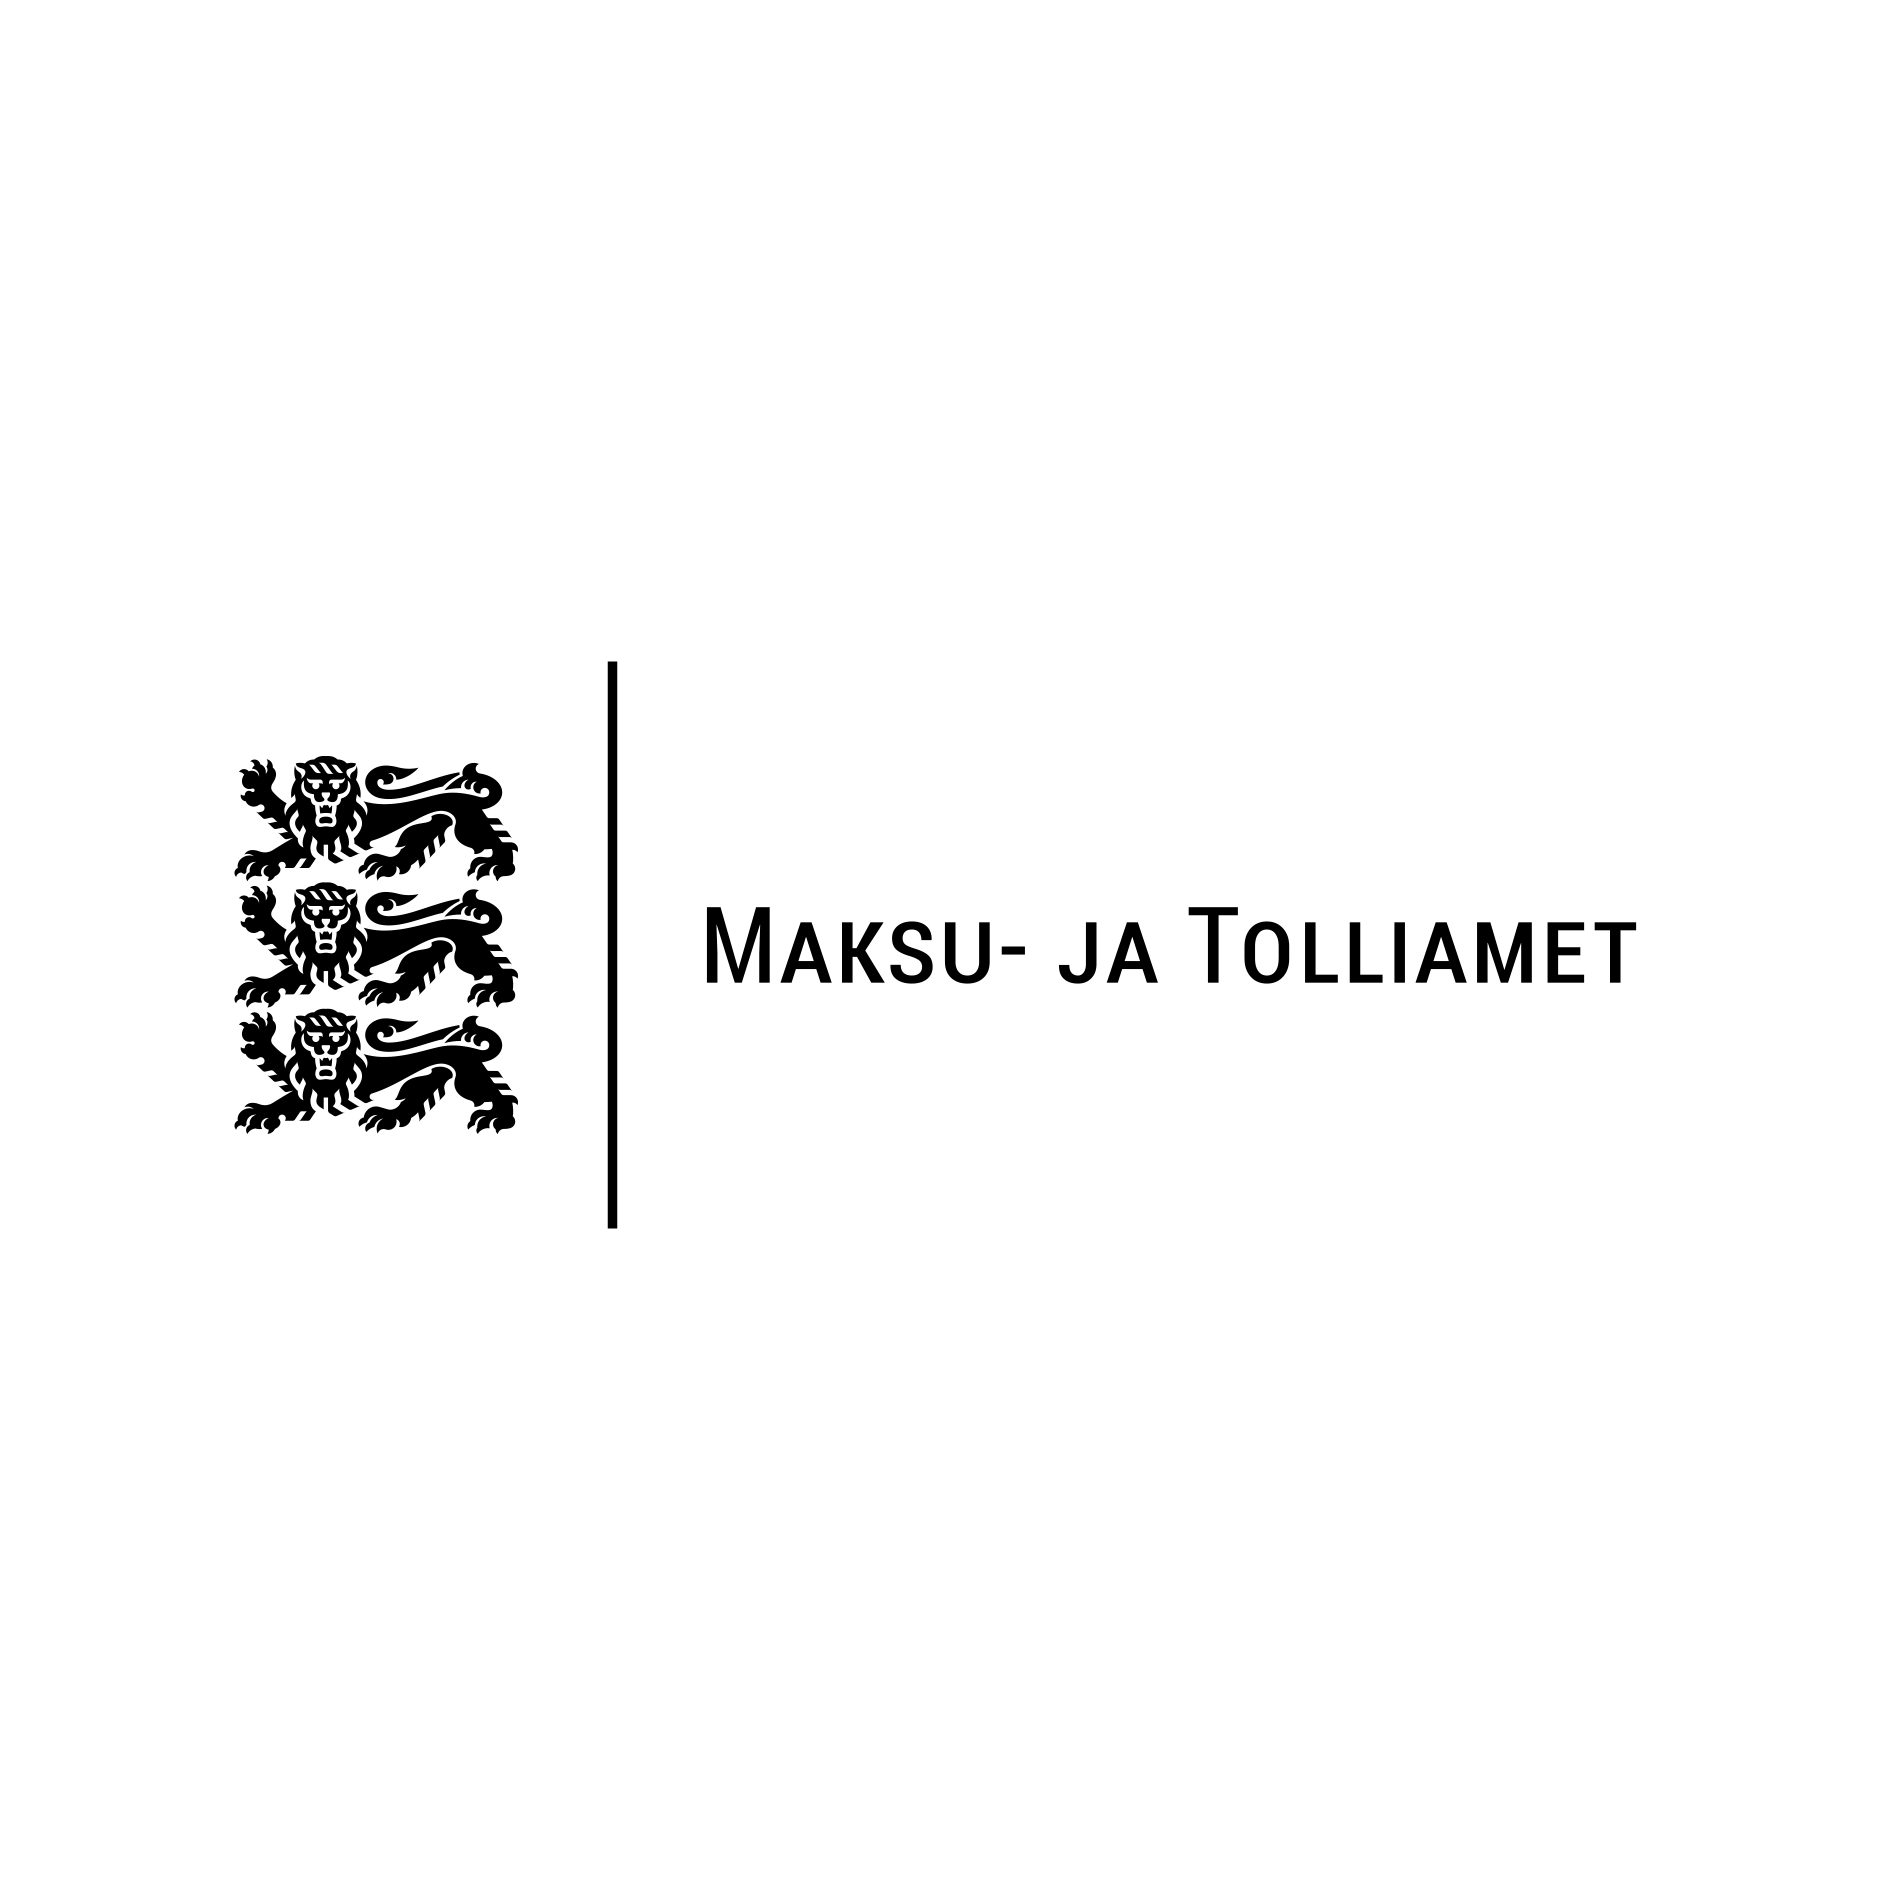 maksuamet_3lovi_est_black